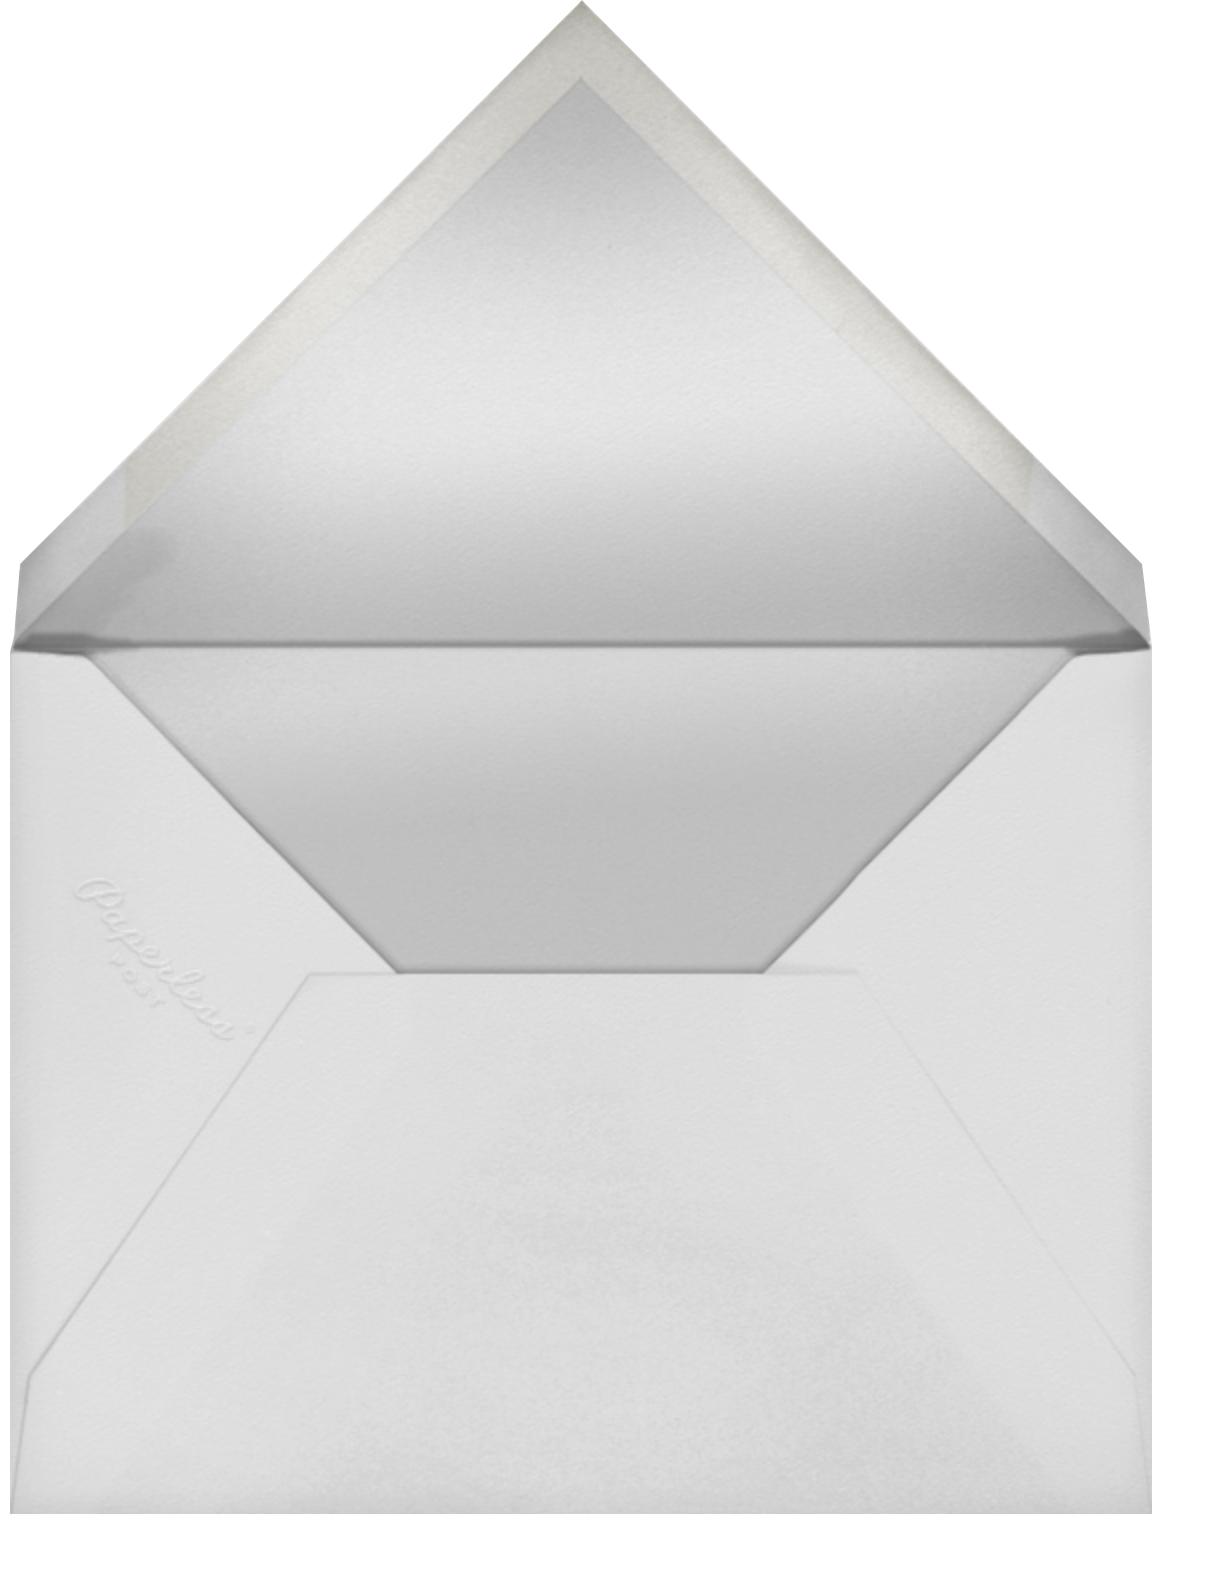 Savoy (Menu) - Silver - Paperless Post - Envelope